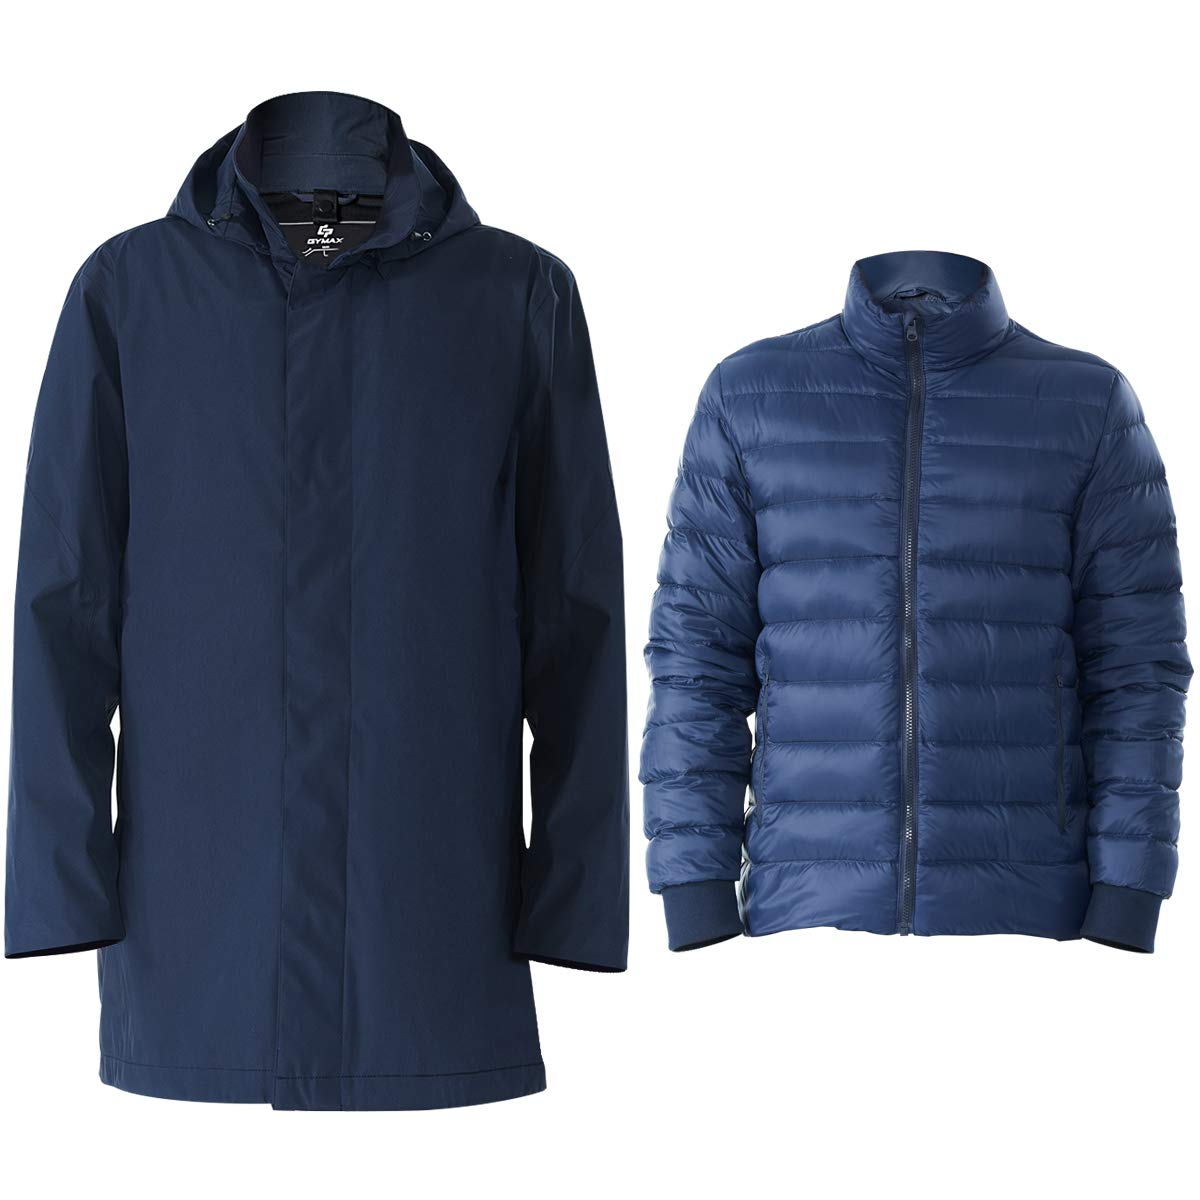 GYMAX 3 in 1 Men's Ski Jacket, Hooded Waterproof Insulated Interchange Coat Winter Parka